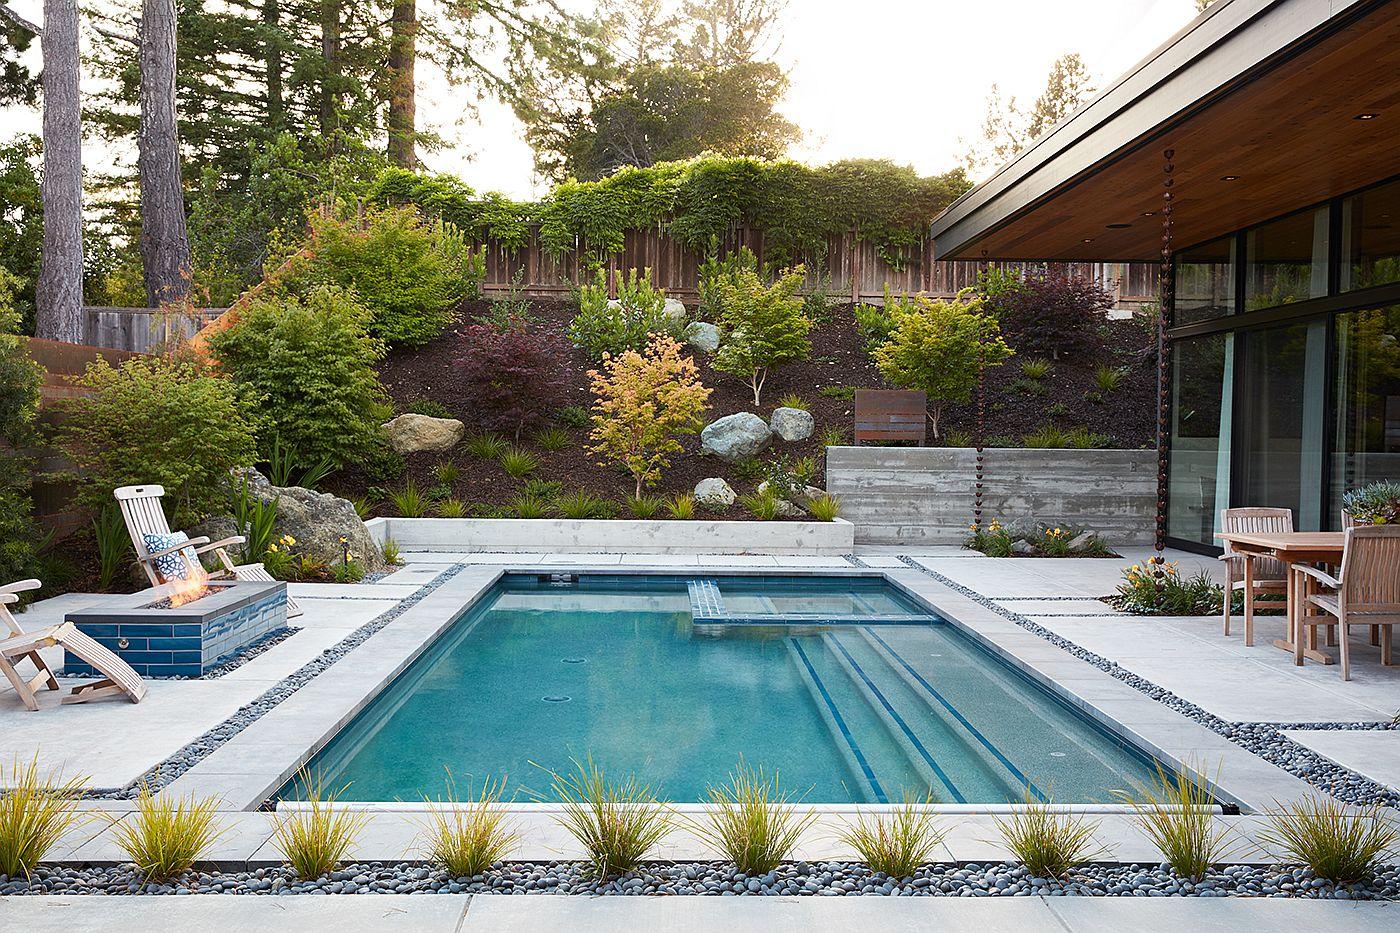 Small backyard pool idea with a smart landscape around it